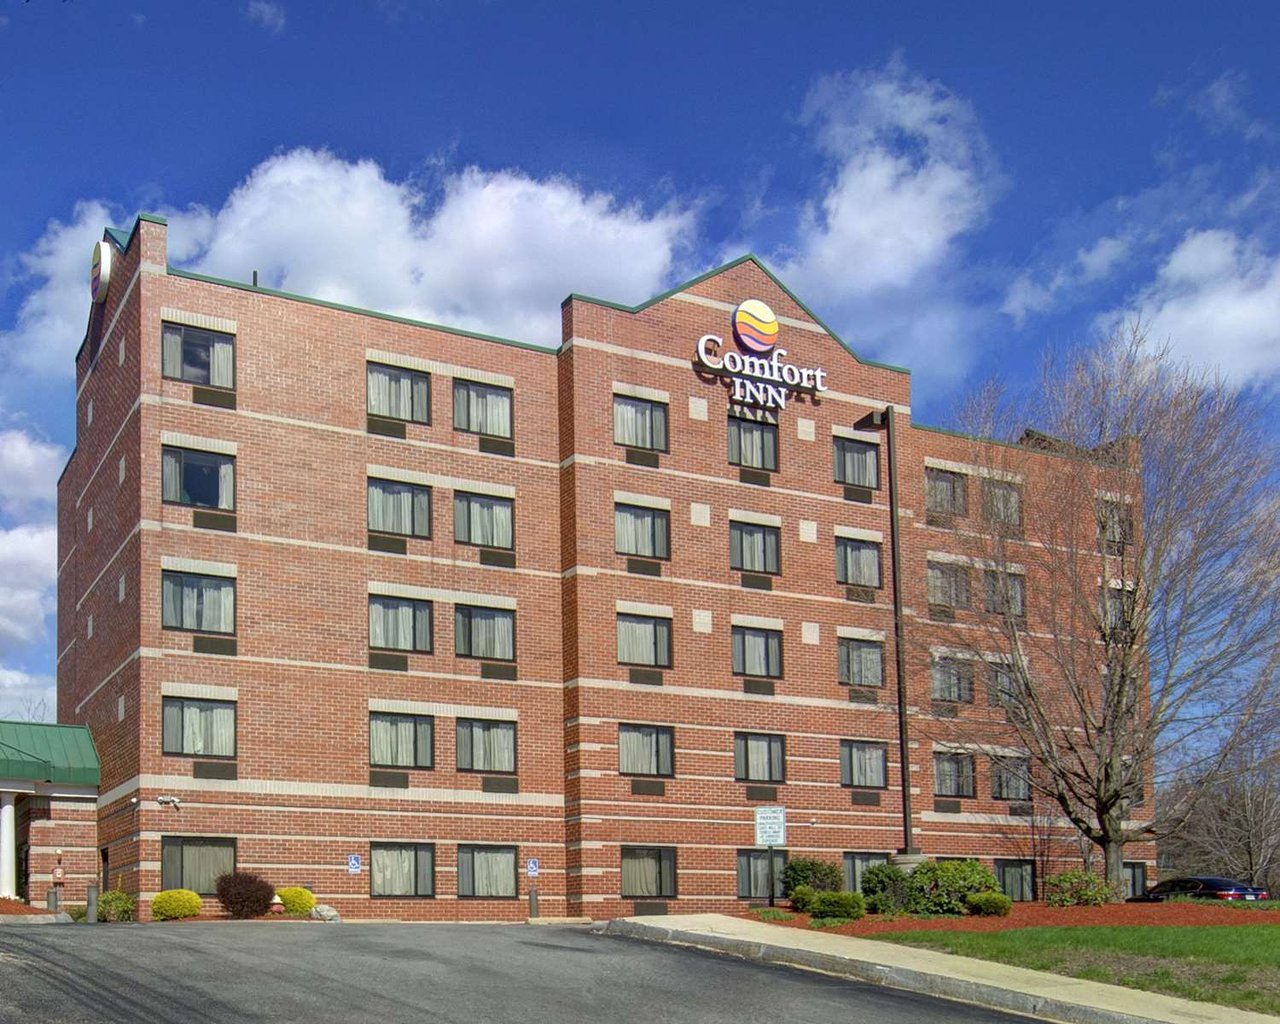 Comfort Inn 71 9 7 Prices Hotel Reviews Woburn Ma Tripadvisor